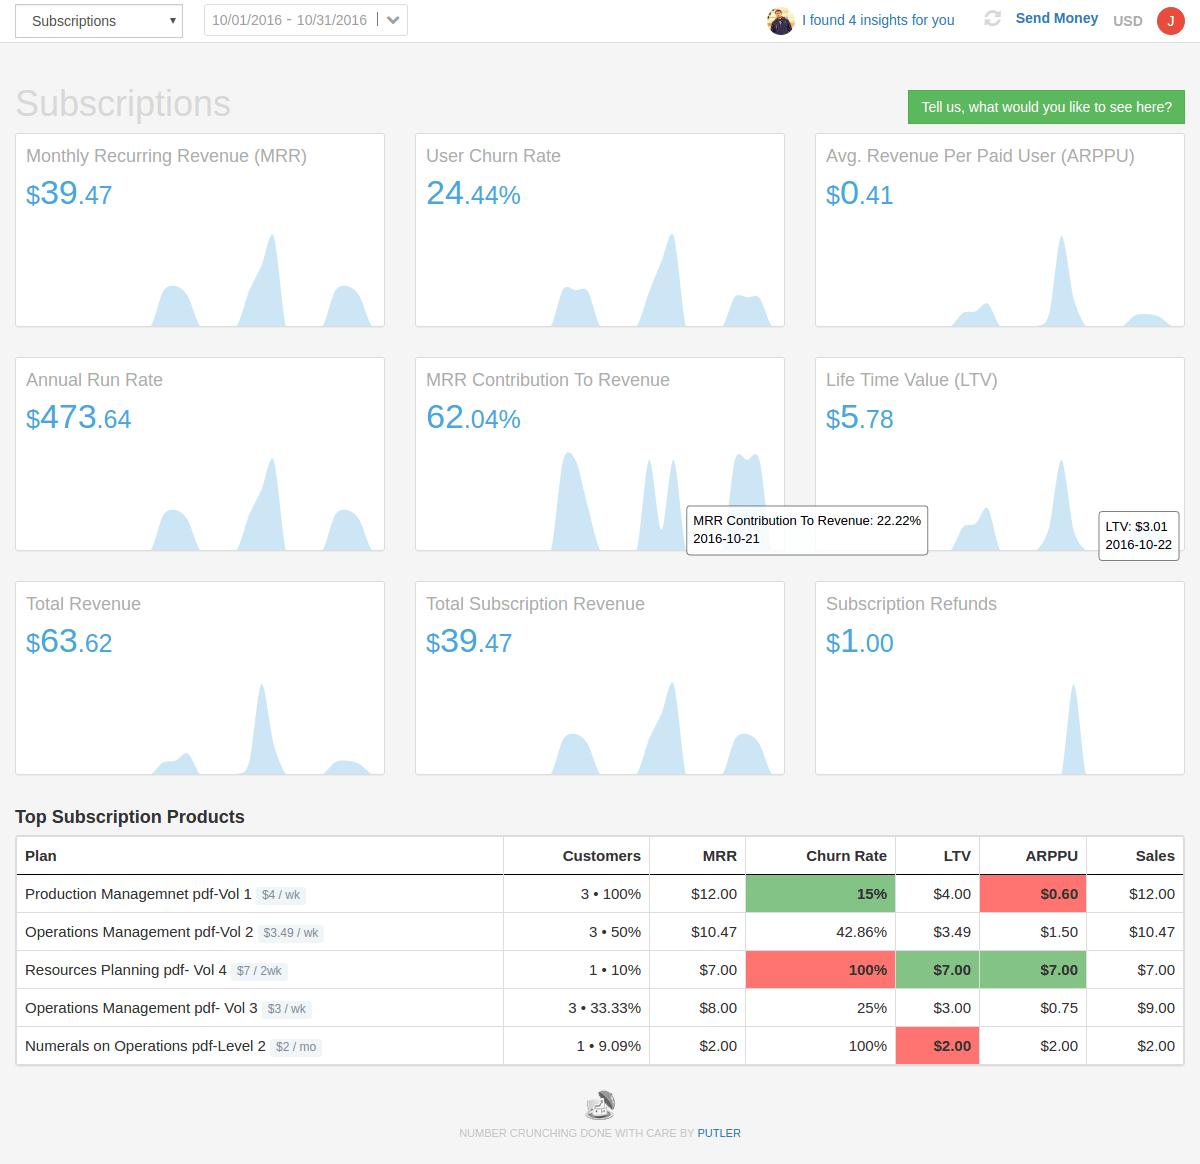 analytics-subscriptions